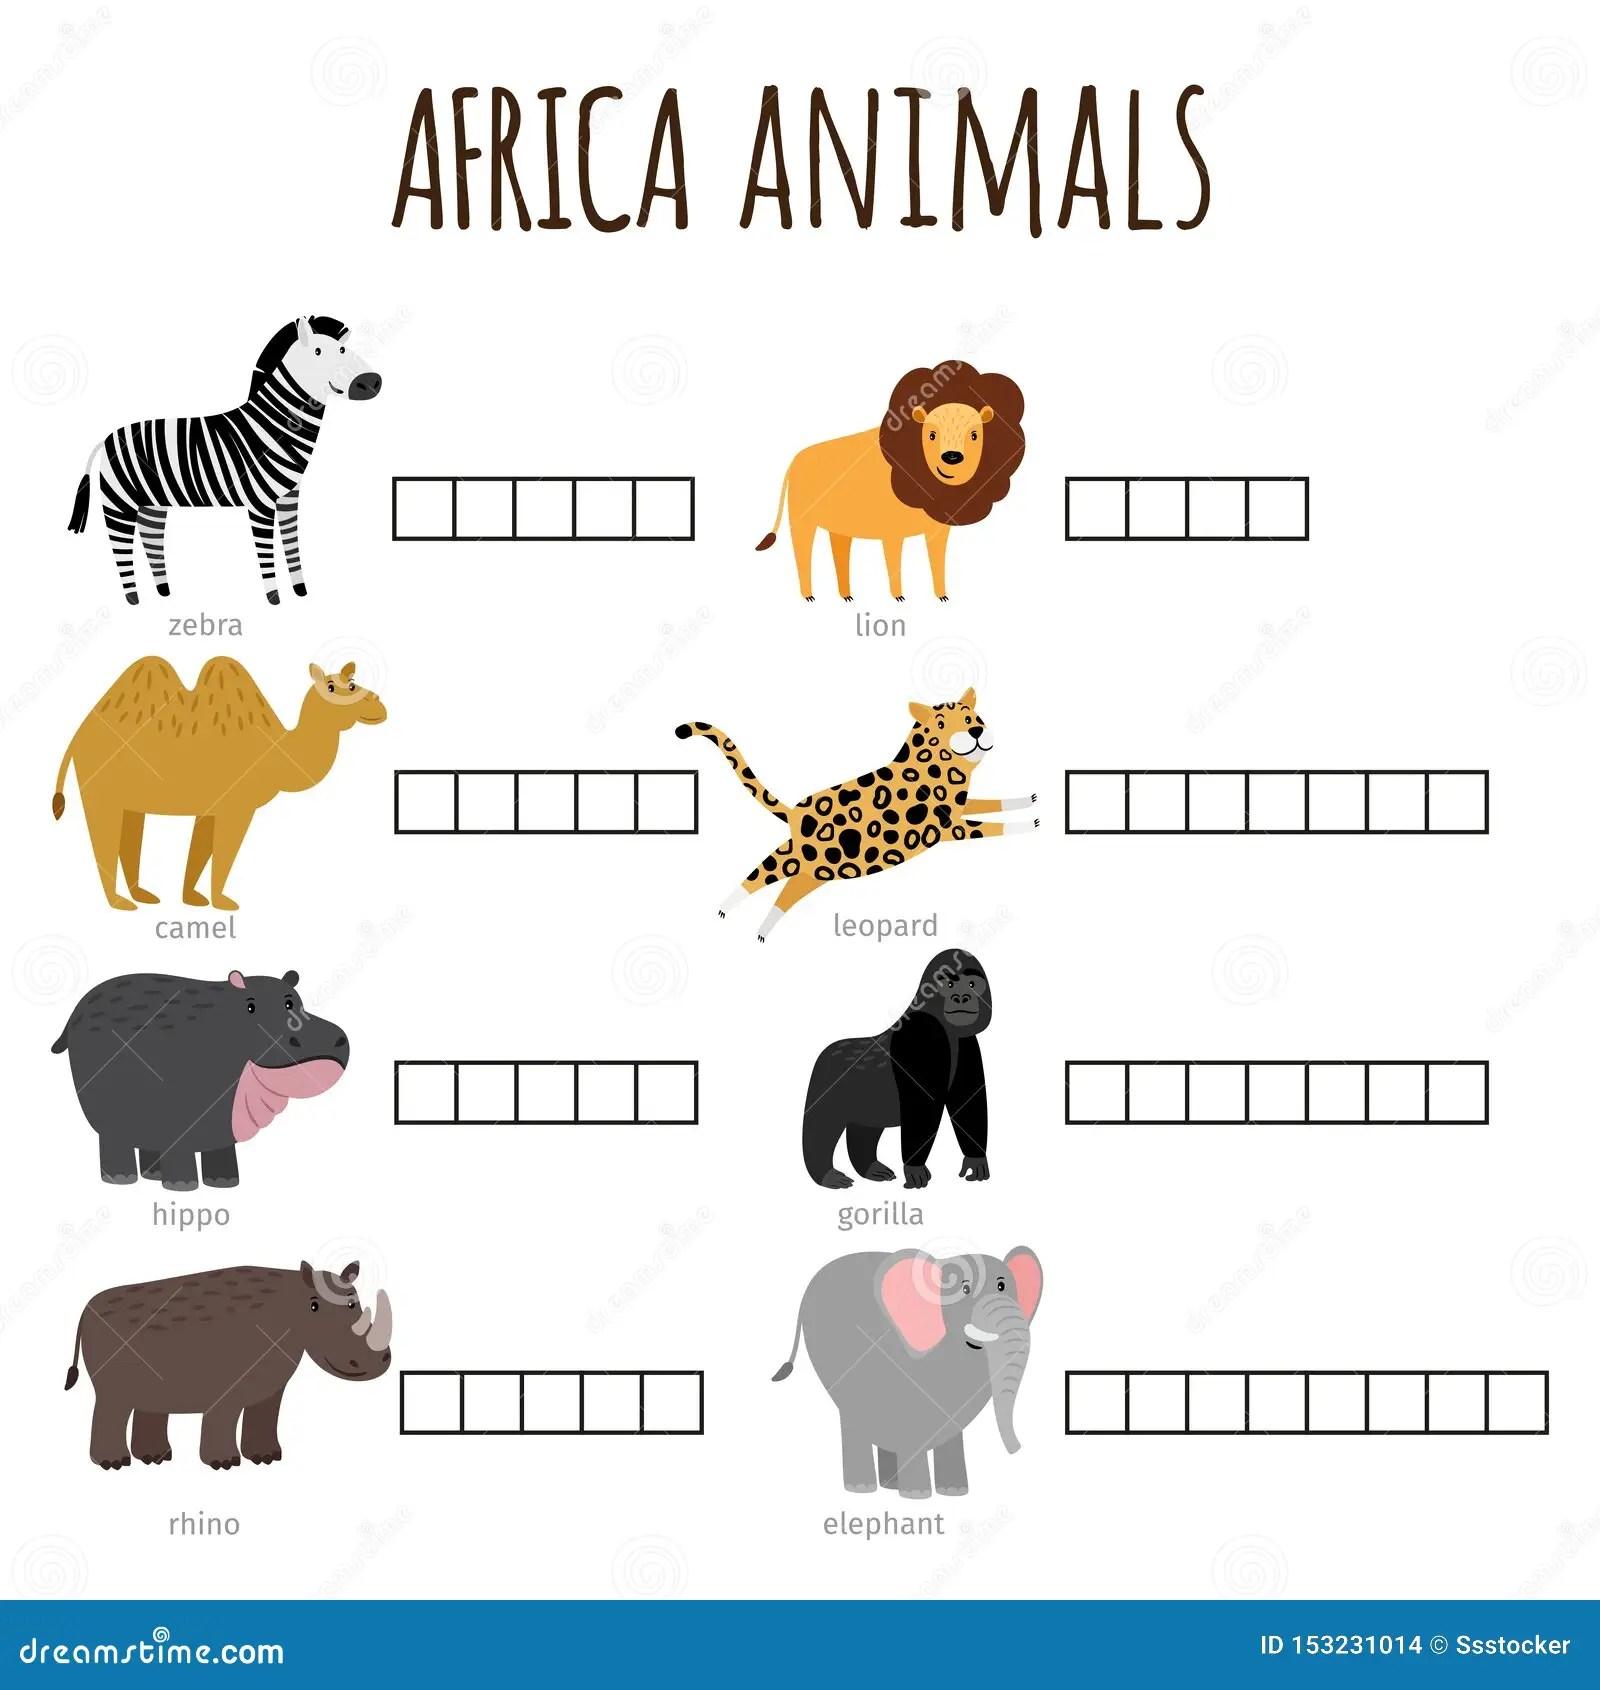 Crossword African Animals Puzzle Games Worksheet